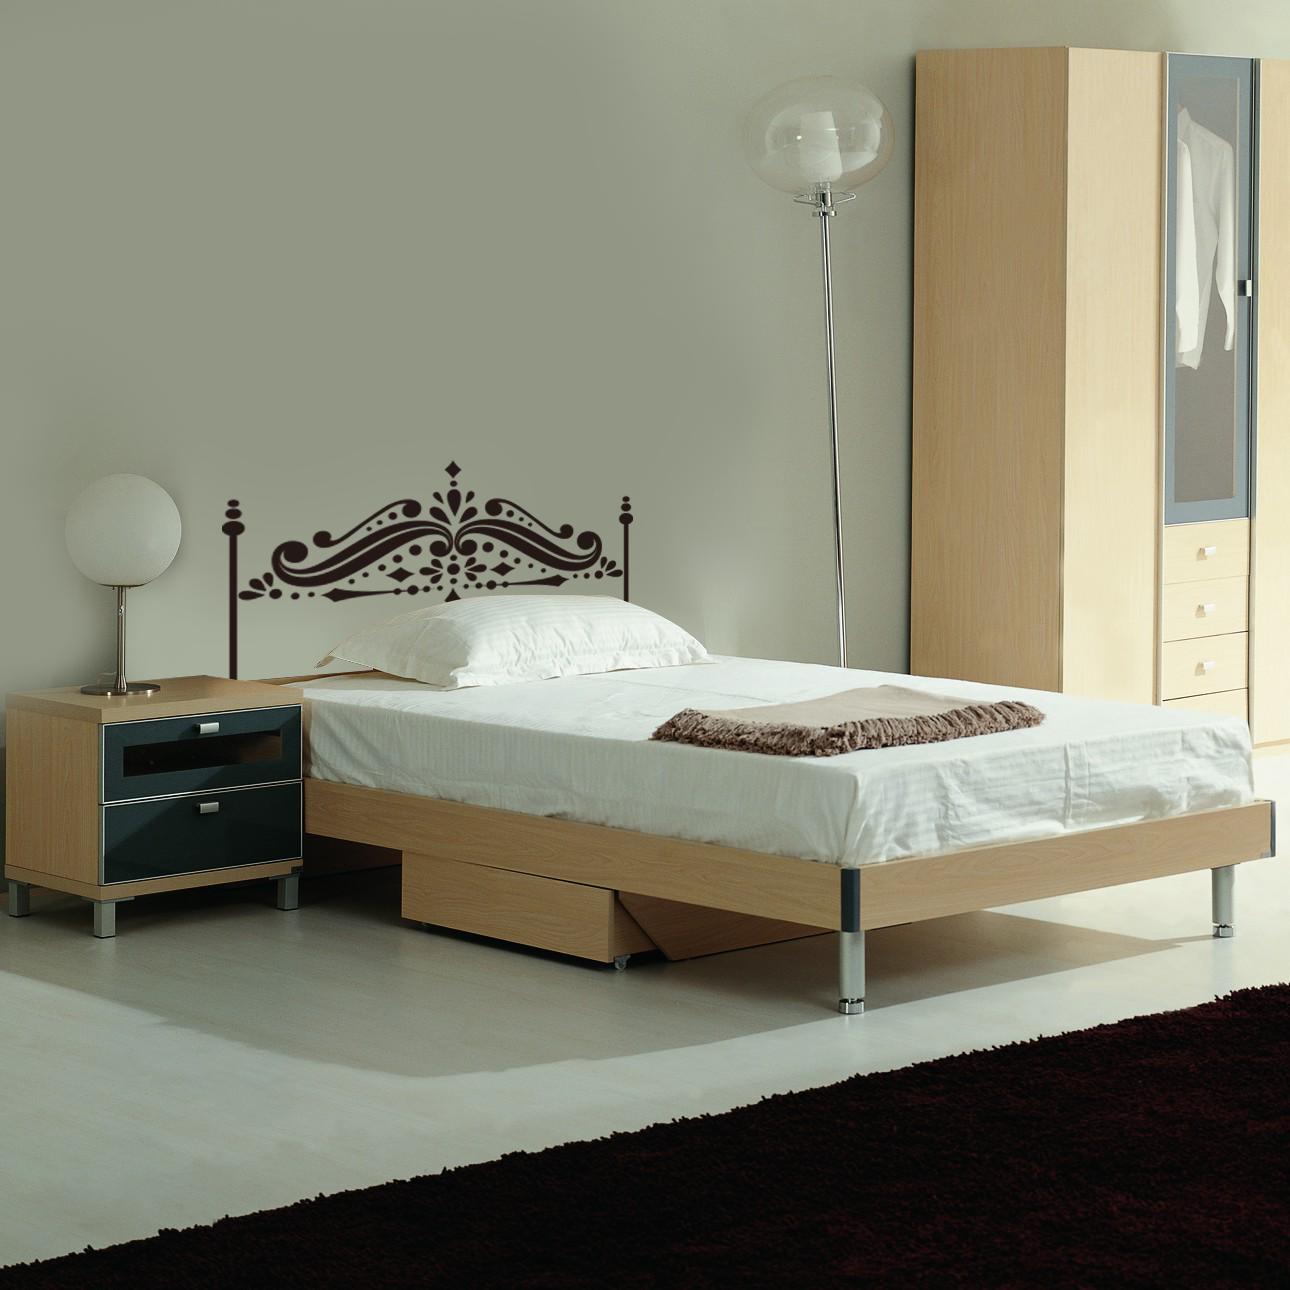 Attlee設計師-創意無痕壁貼.單人床頭板/床架 壁貼HDWS-10